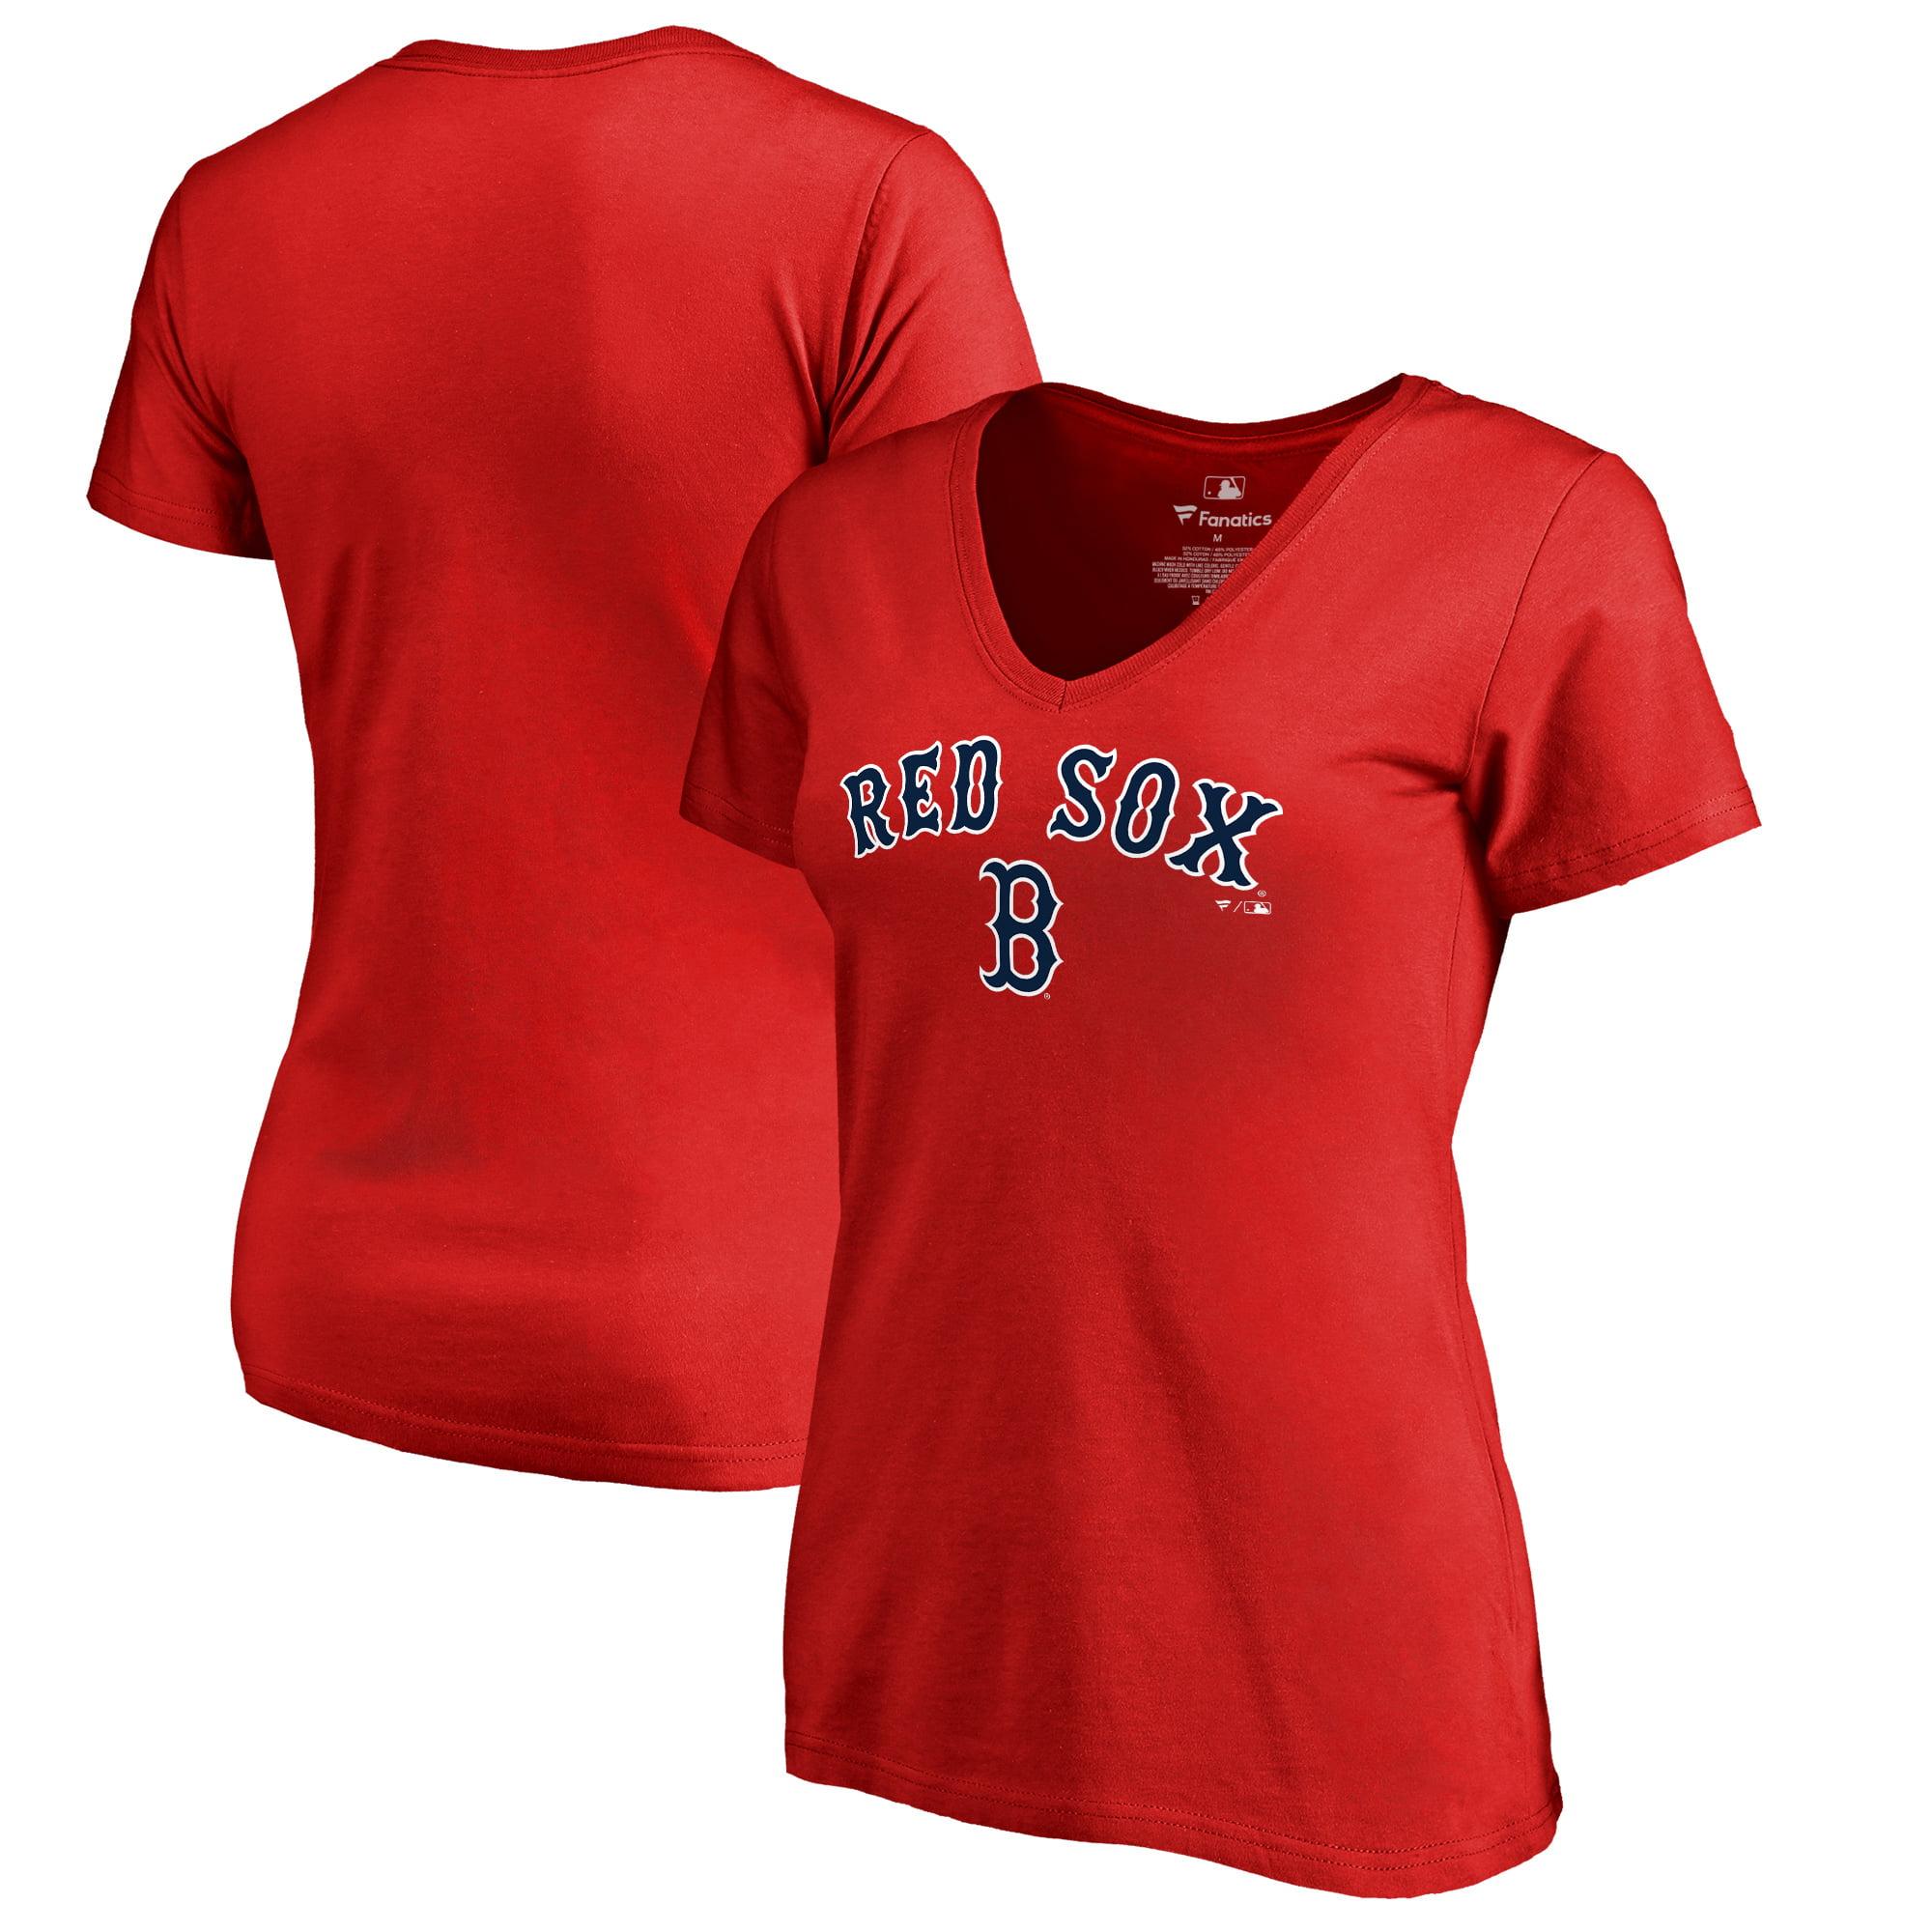 Boston Red Sox Fanatics Branded Women's Team Lockup V-Neck T-Shirt - Red